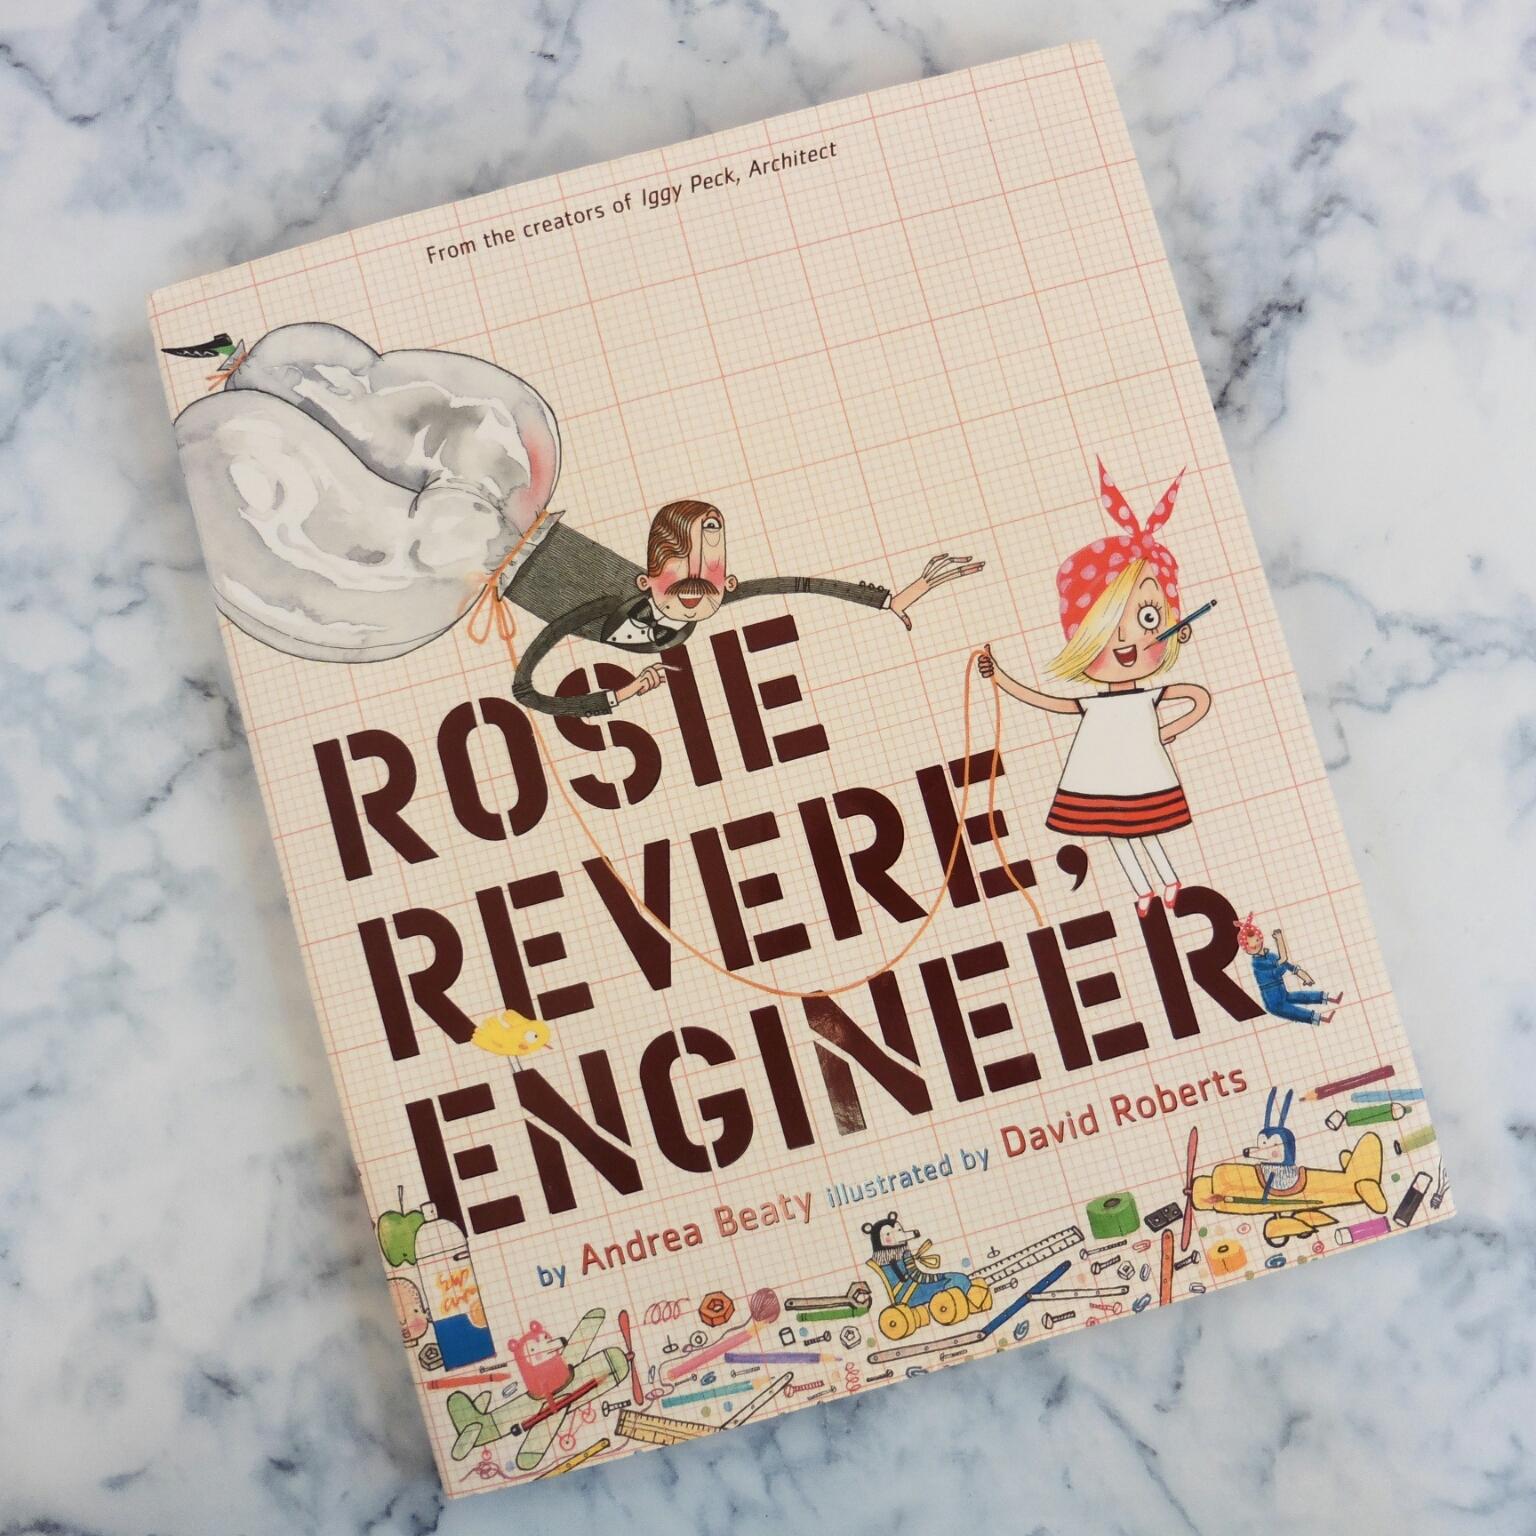 rosie-revere